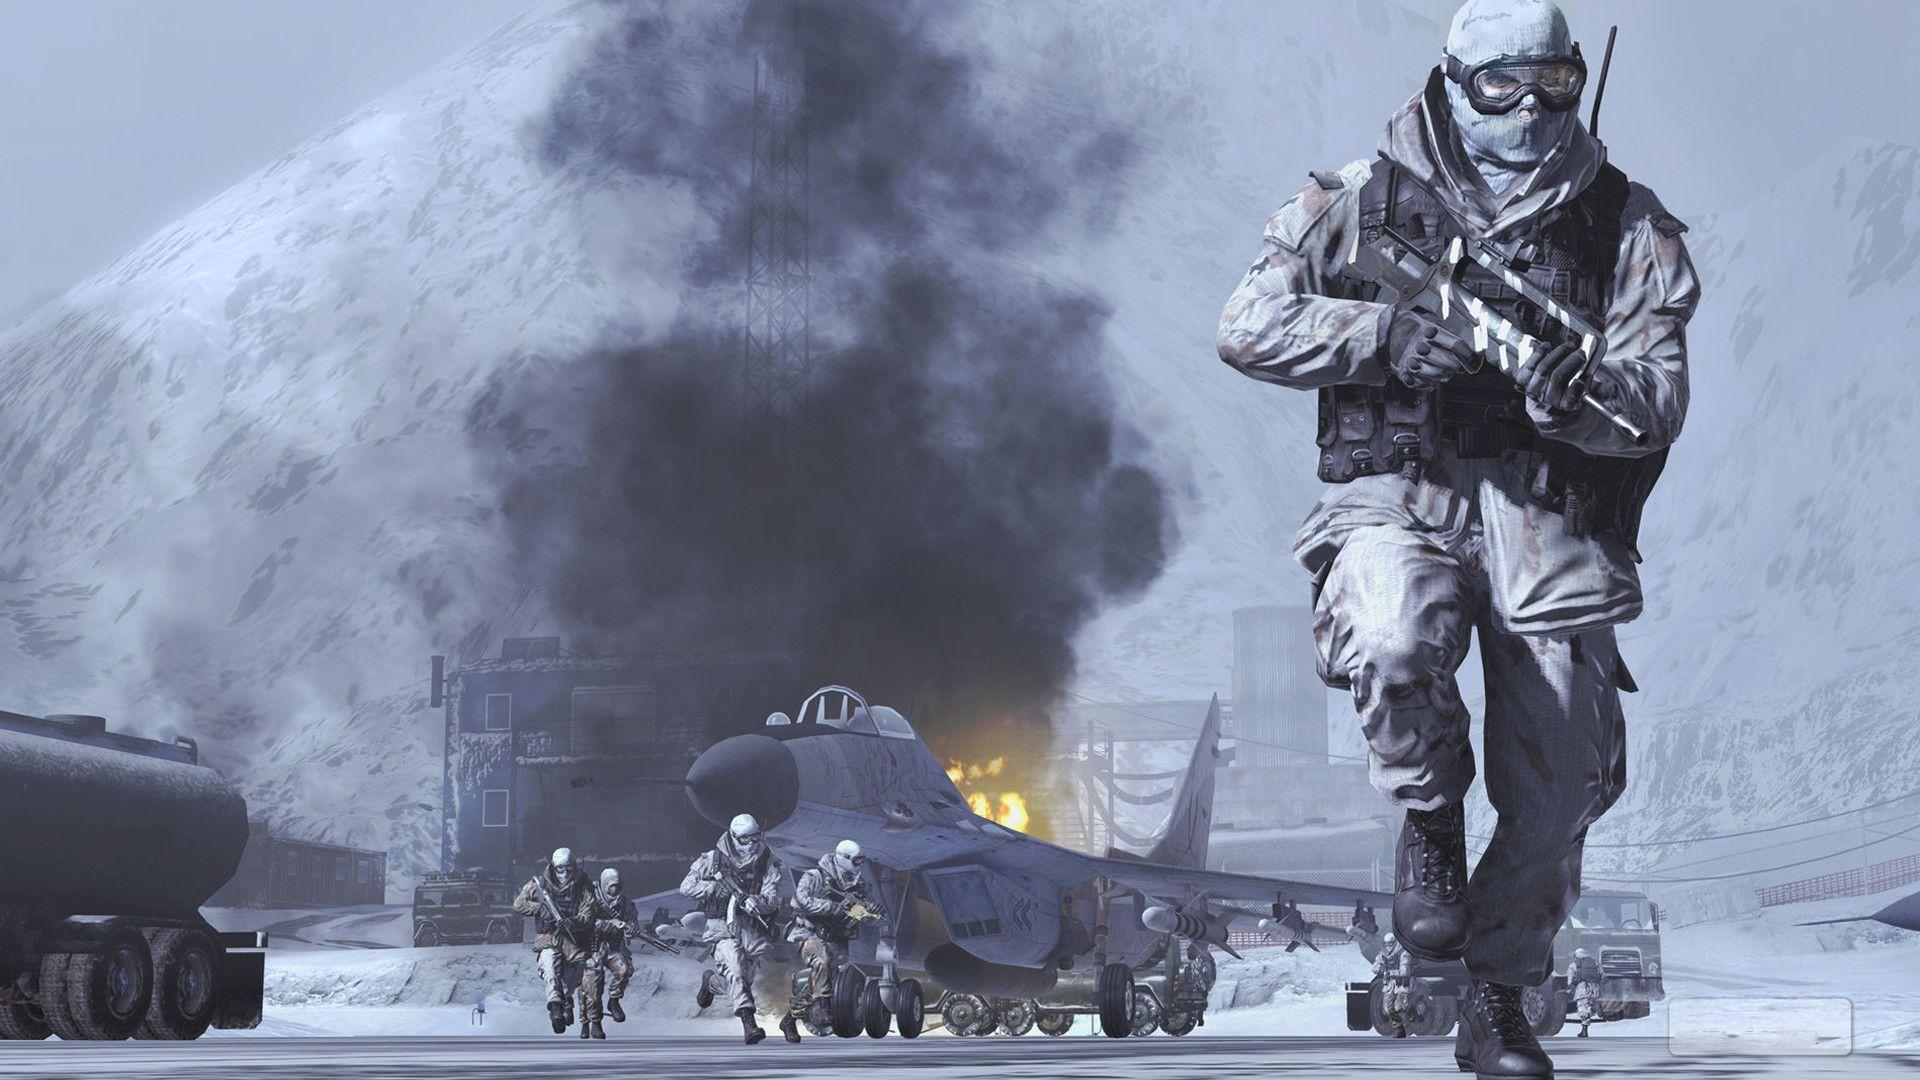 Call Of Duty Modern Warfare 2 Wallpaper 1080p Yokkaichicon